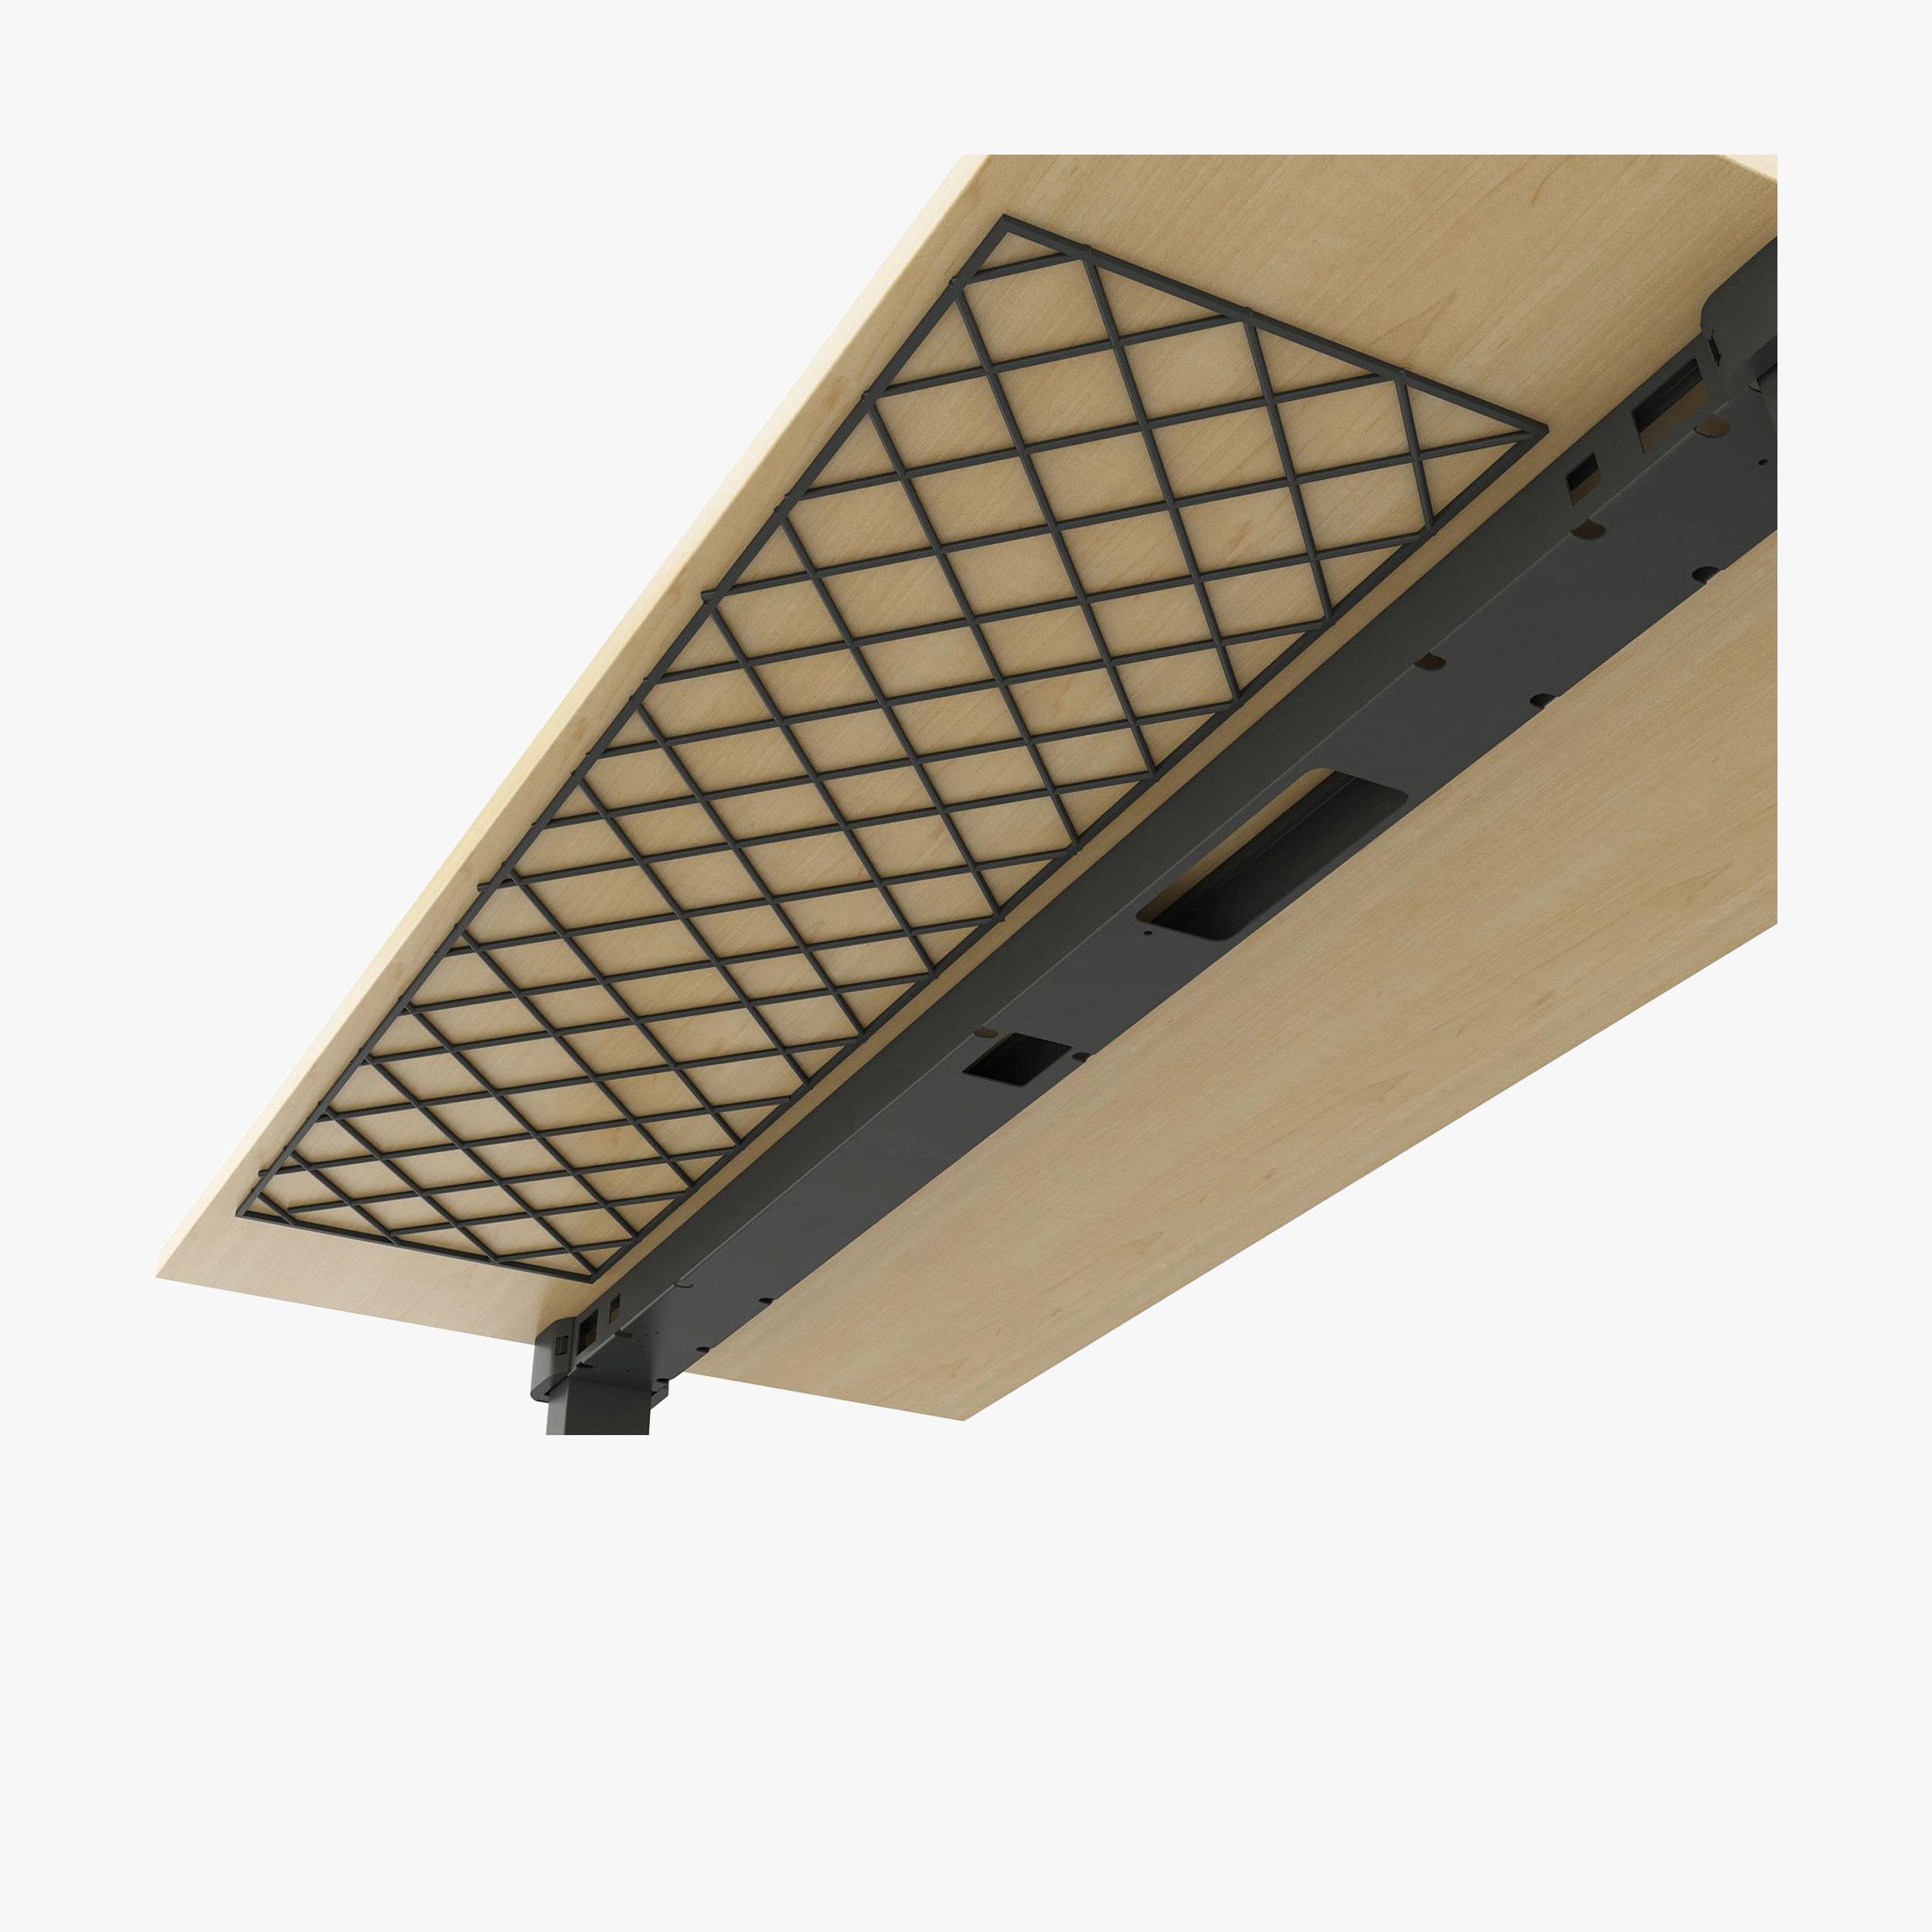 Steelcase Migration SE Height Adjustable Bench Desk Cable Net Detail Image